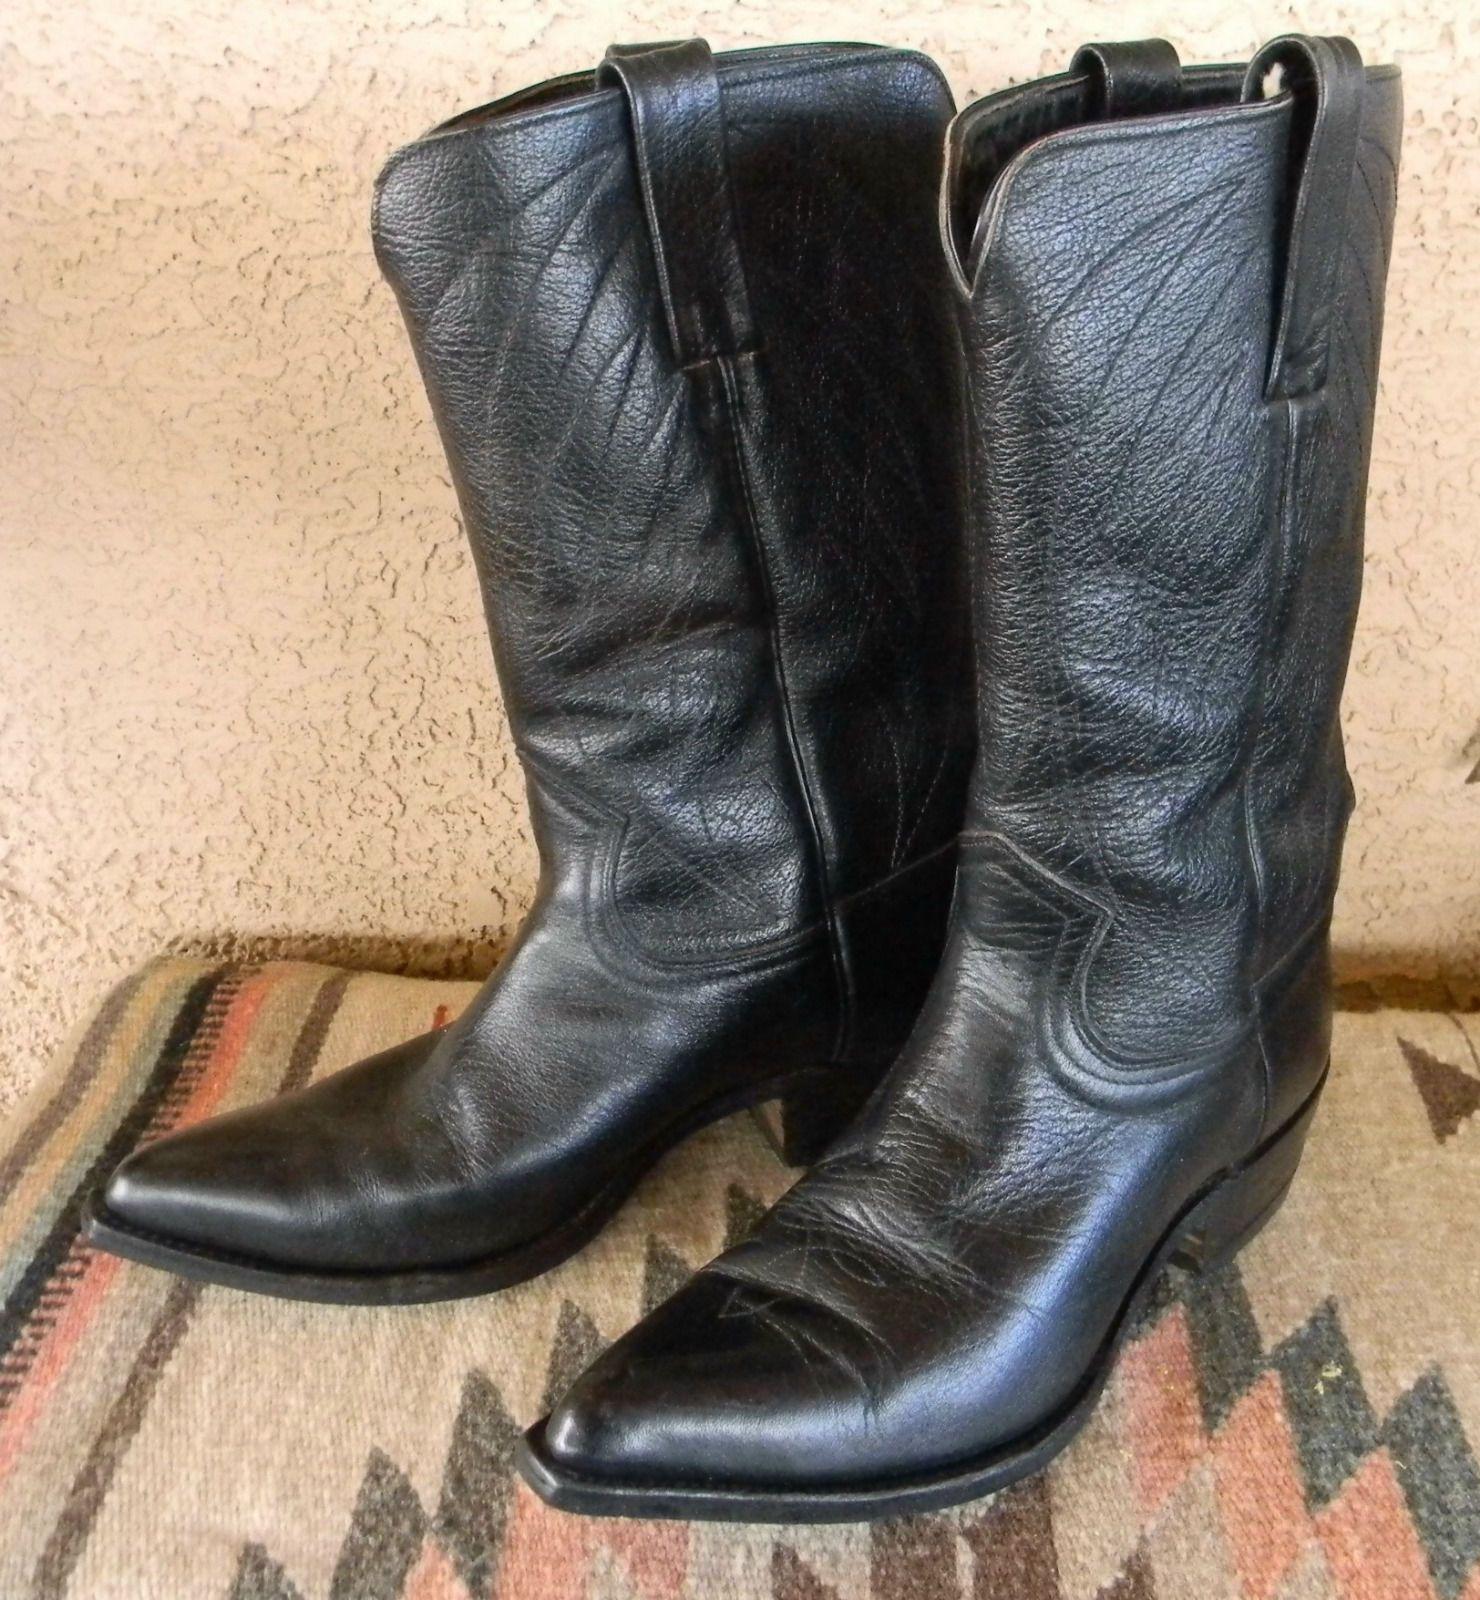 frye shoes for men 11 eee boots uk beauty